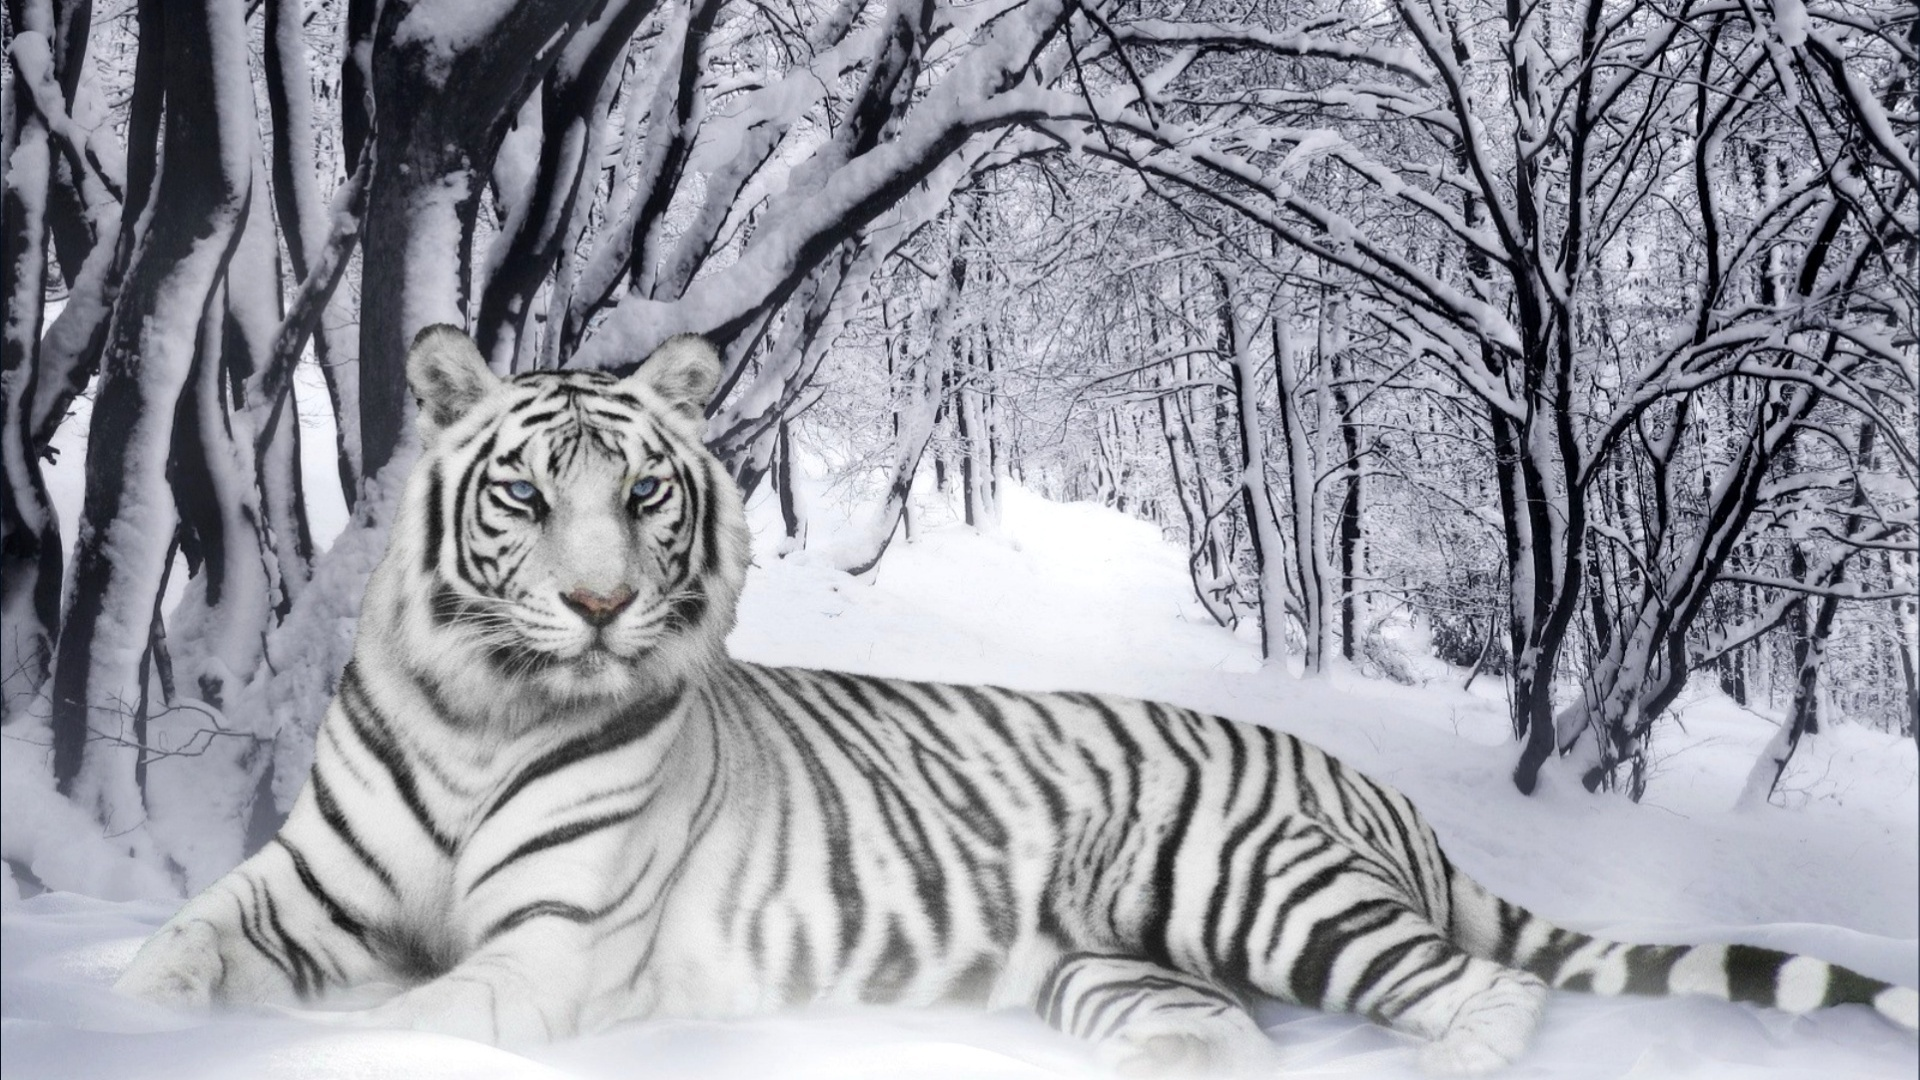 White Tigerfree widescreen